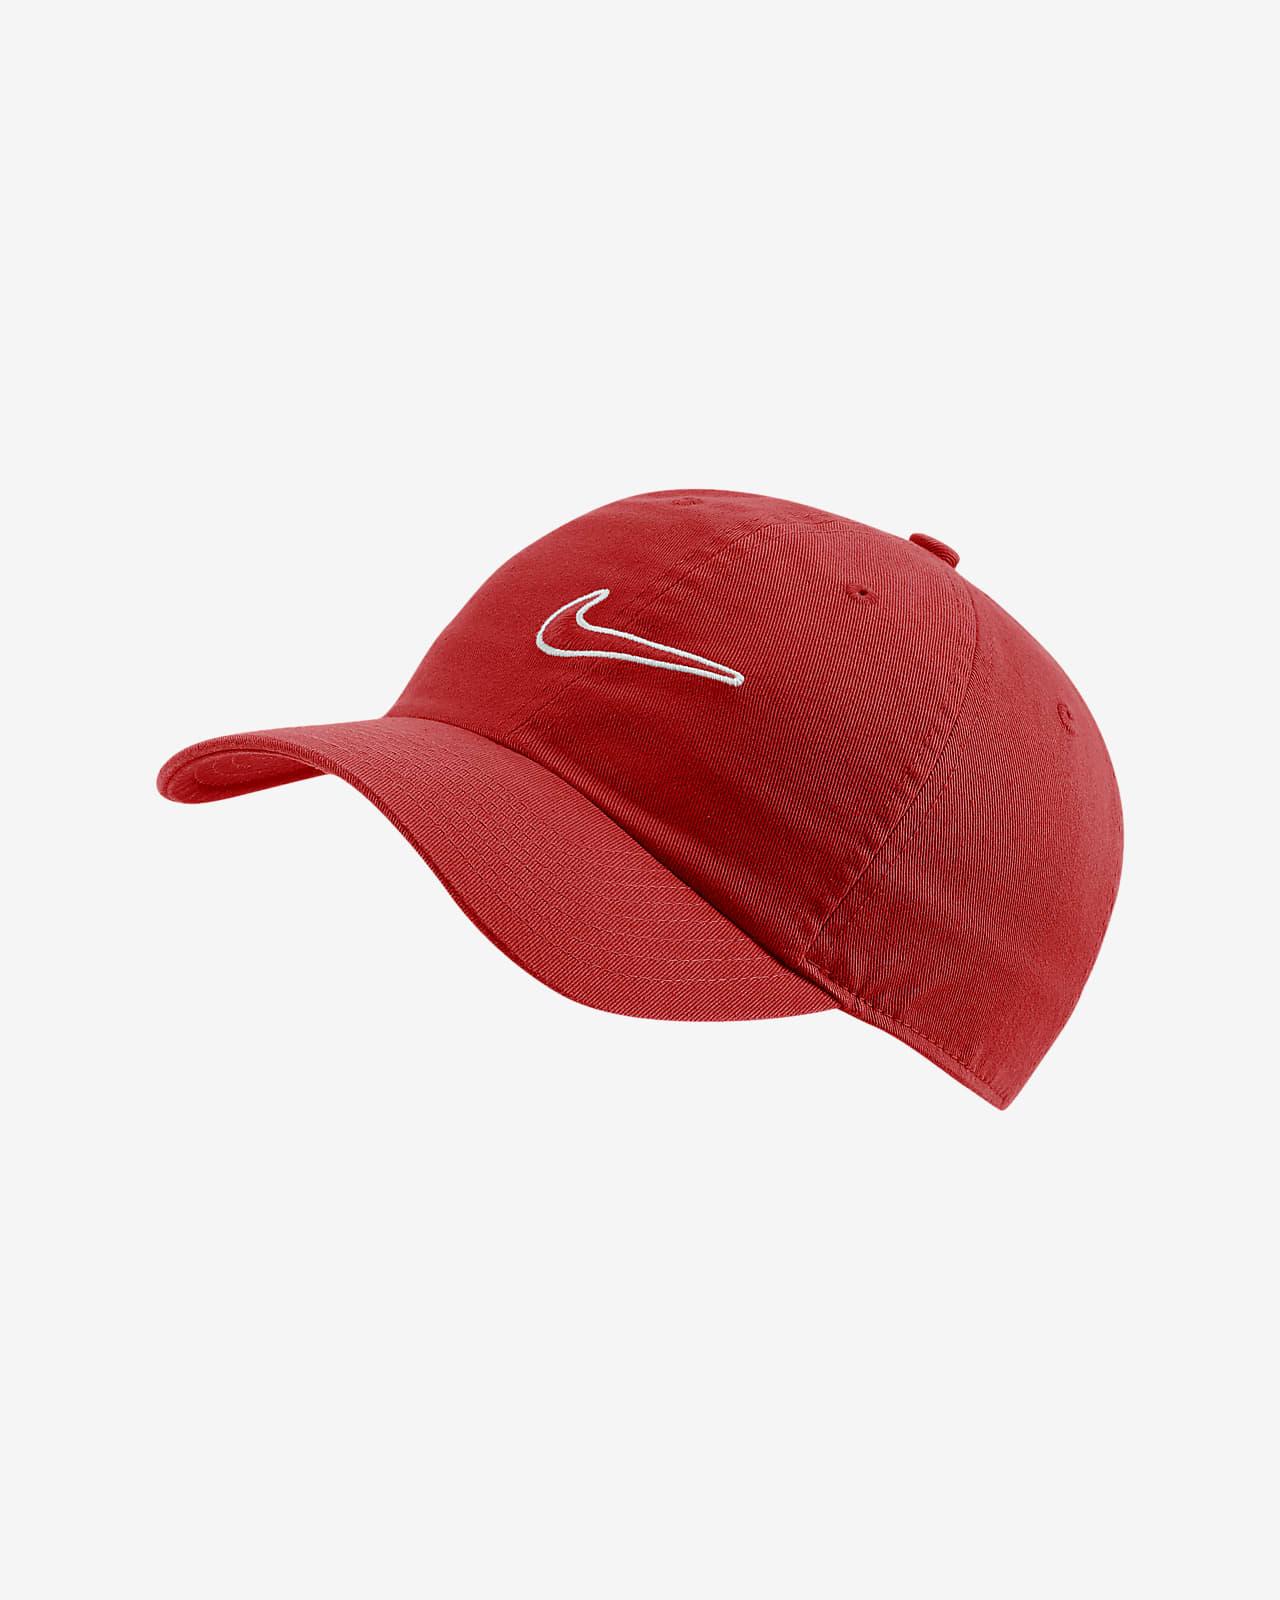 Nike Sportswear Heritage 86 Adjustable Cap